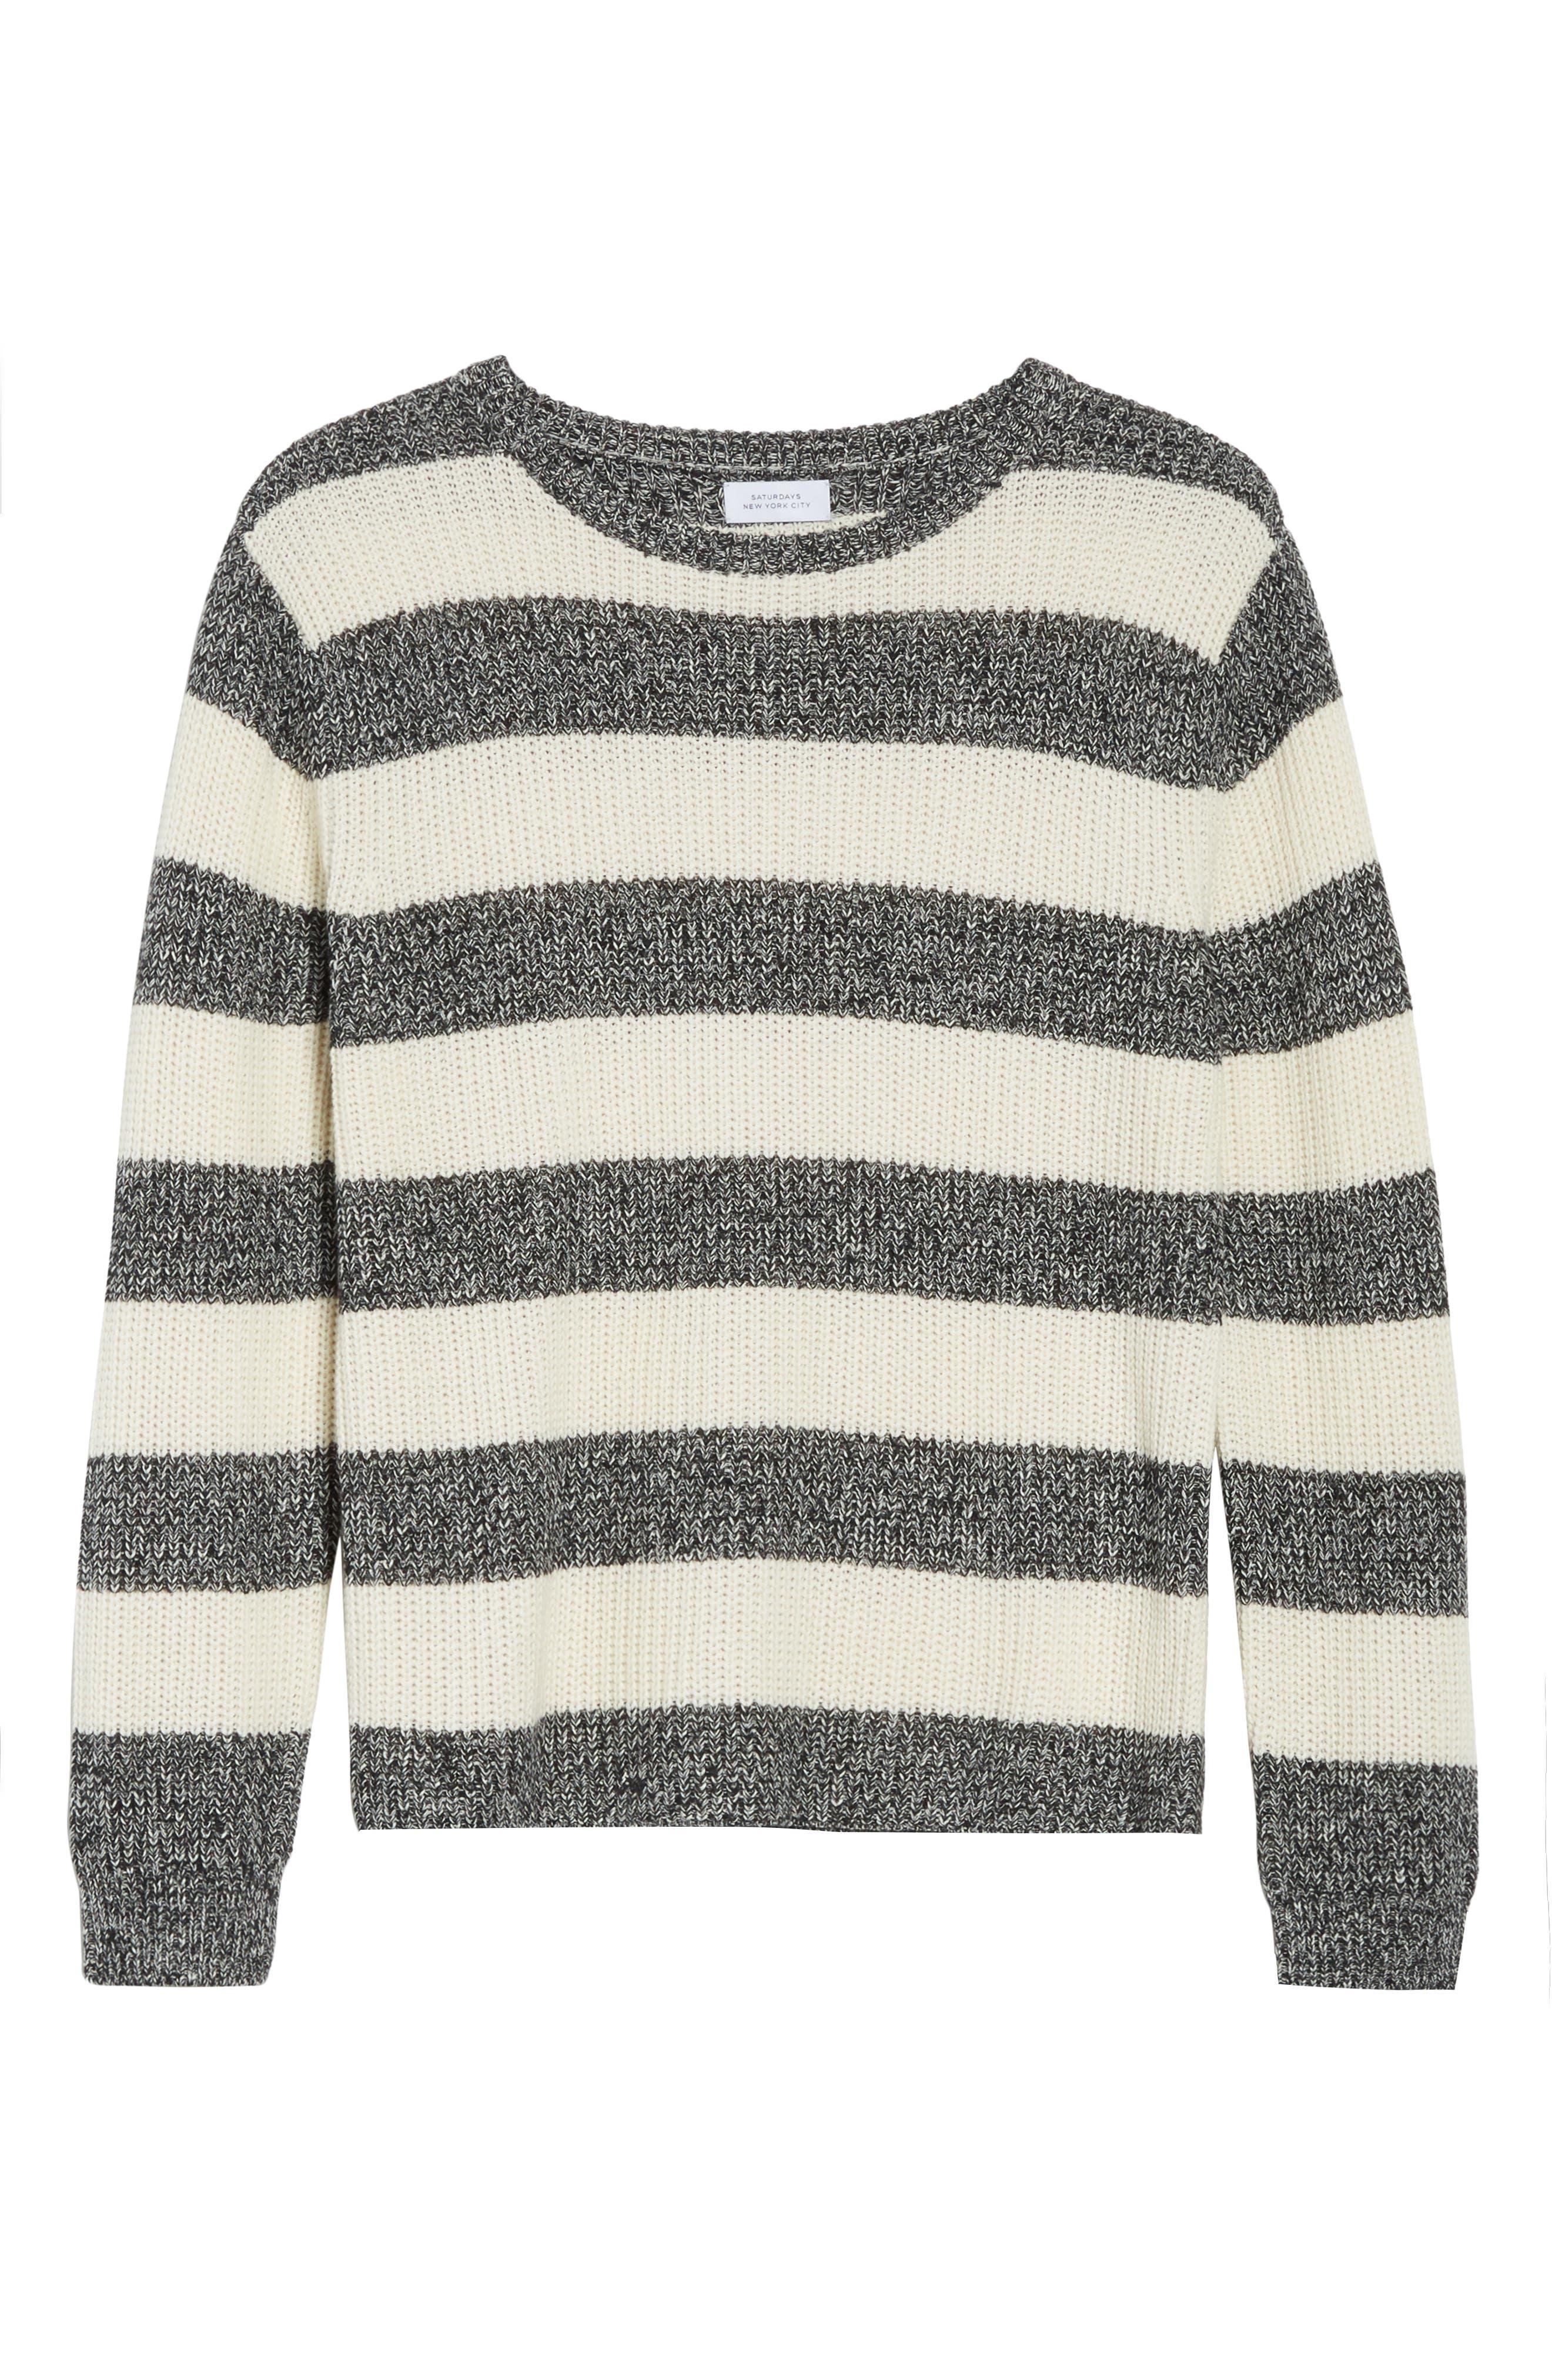 Lee Stripe Crewneck Sweater,                             Alternate thumbnail 6, color,                             101